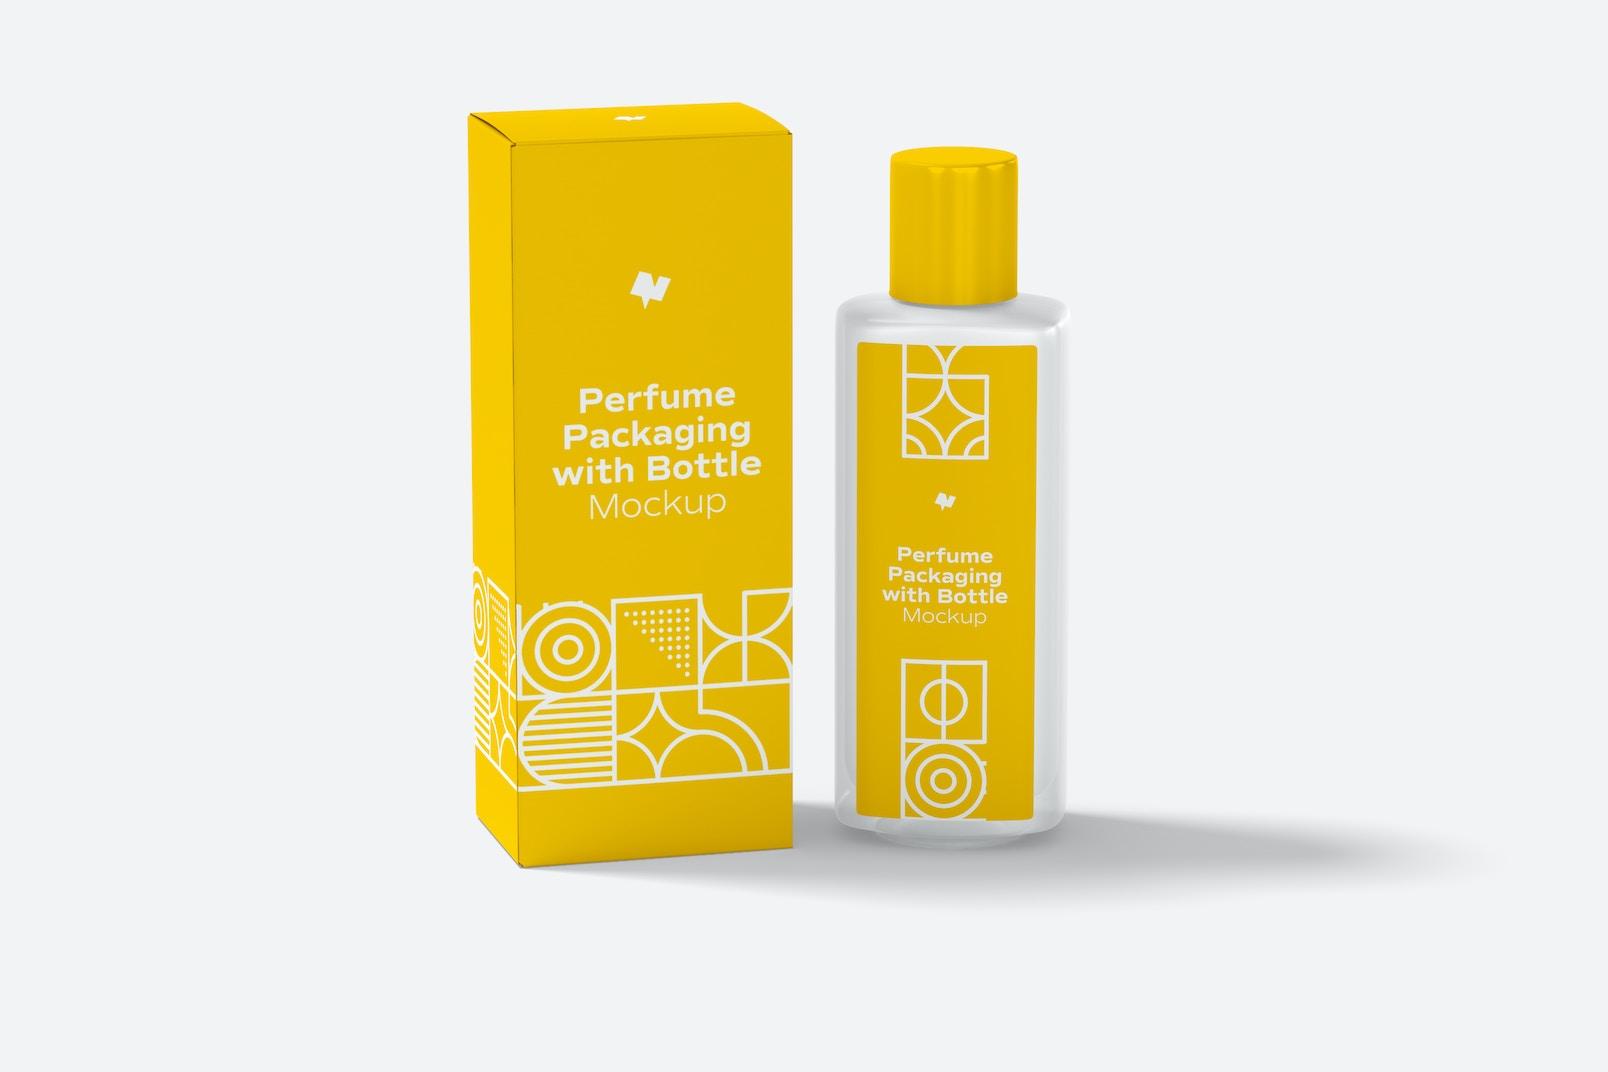 Maqueta de Empaque Grande de Perfume con Botella